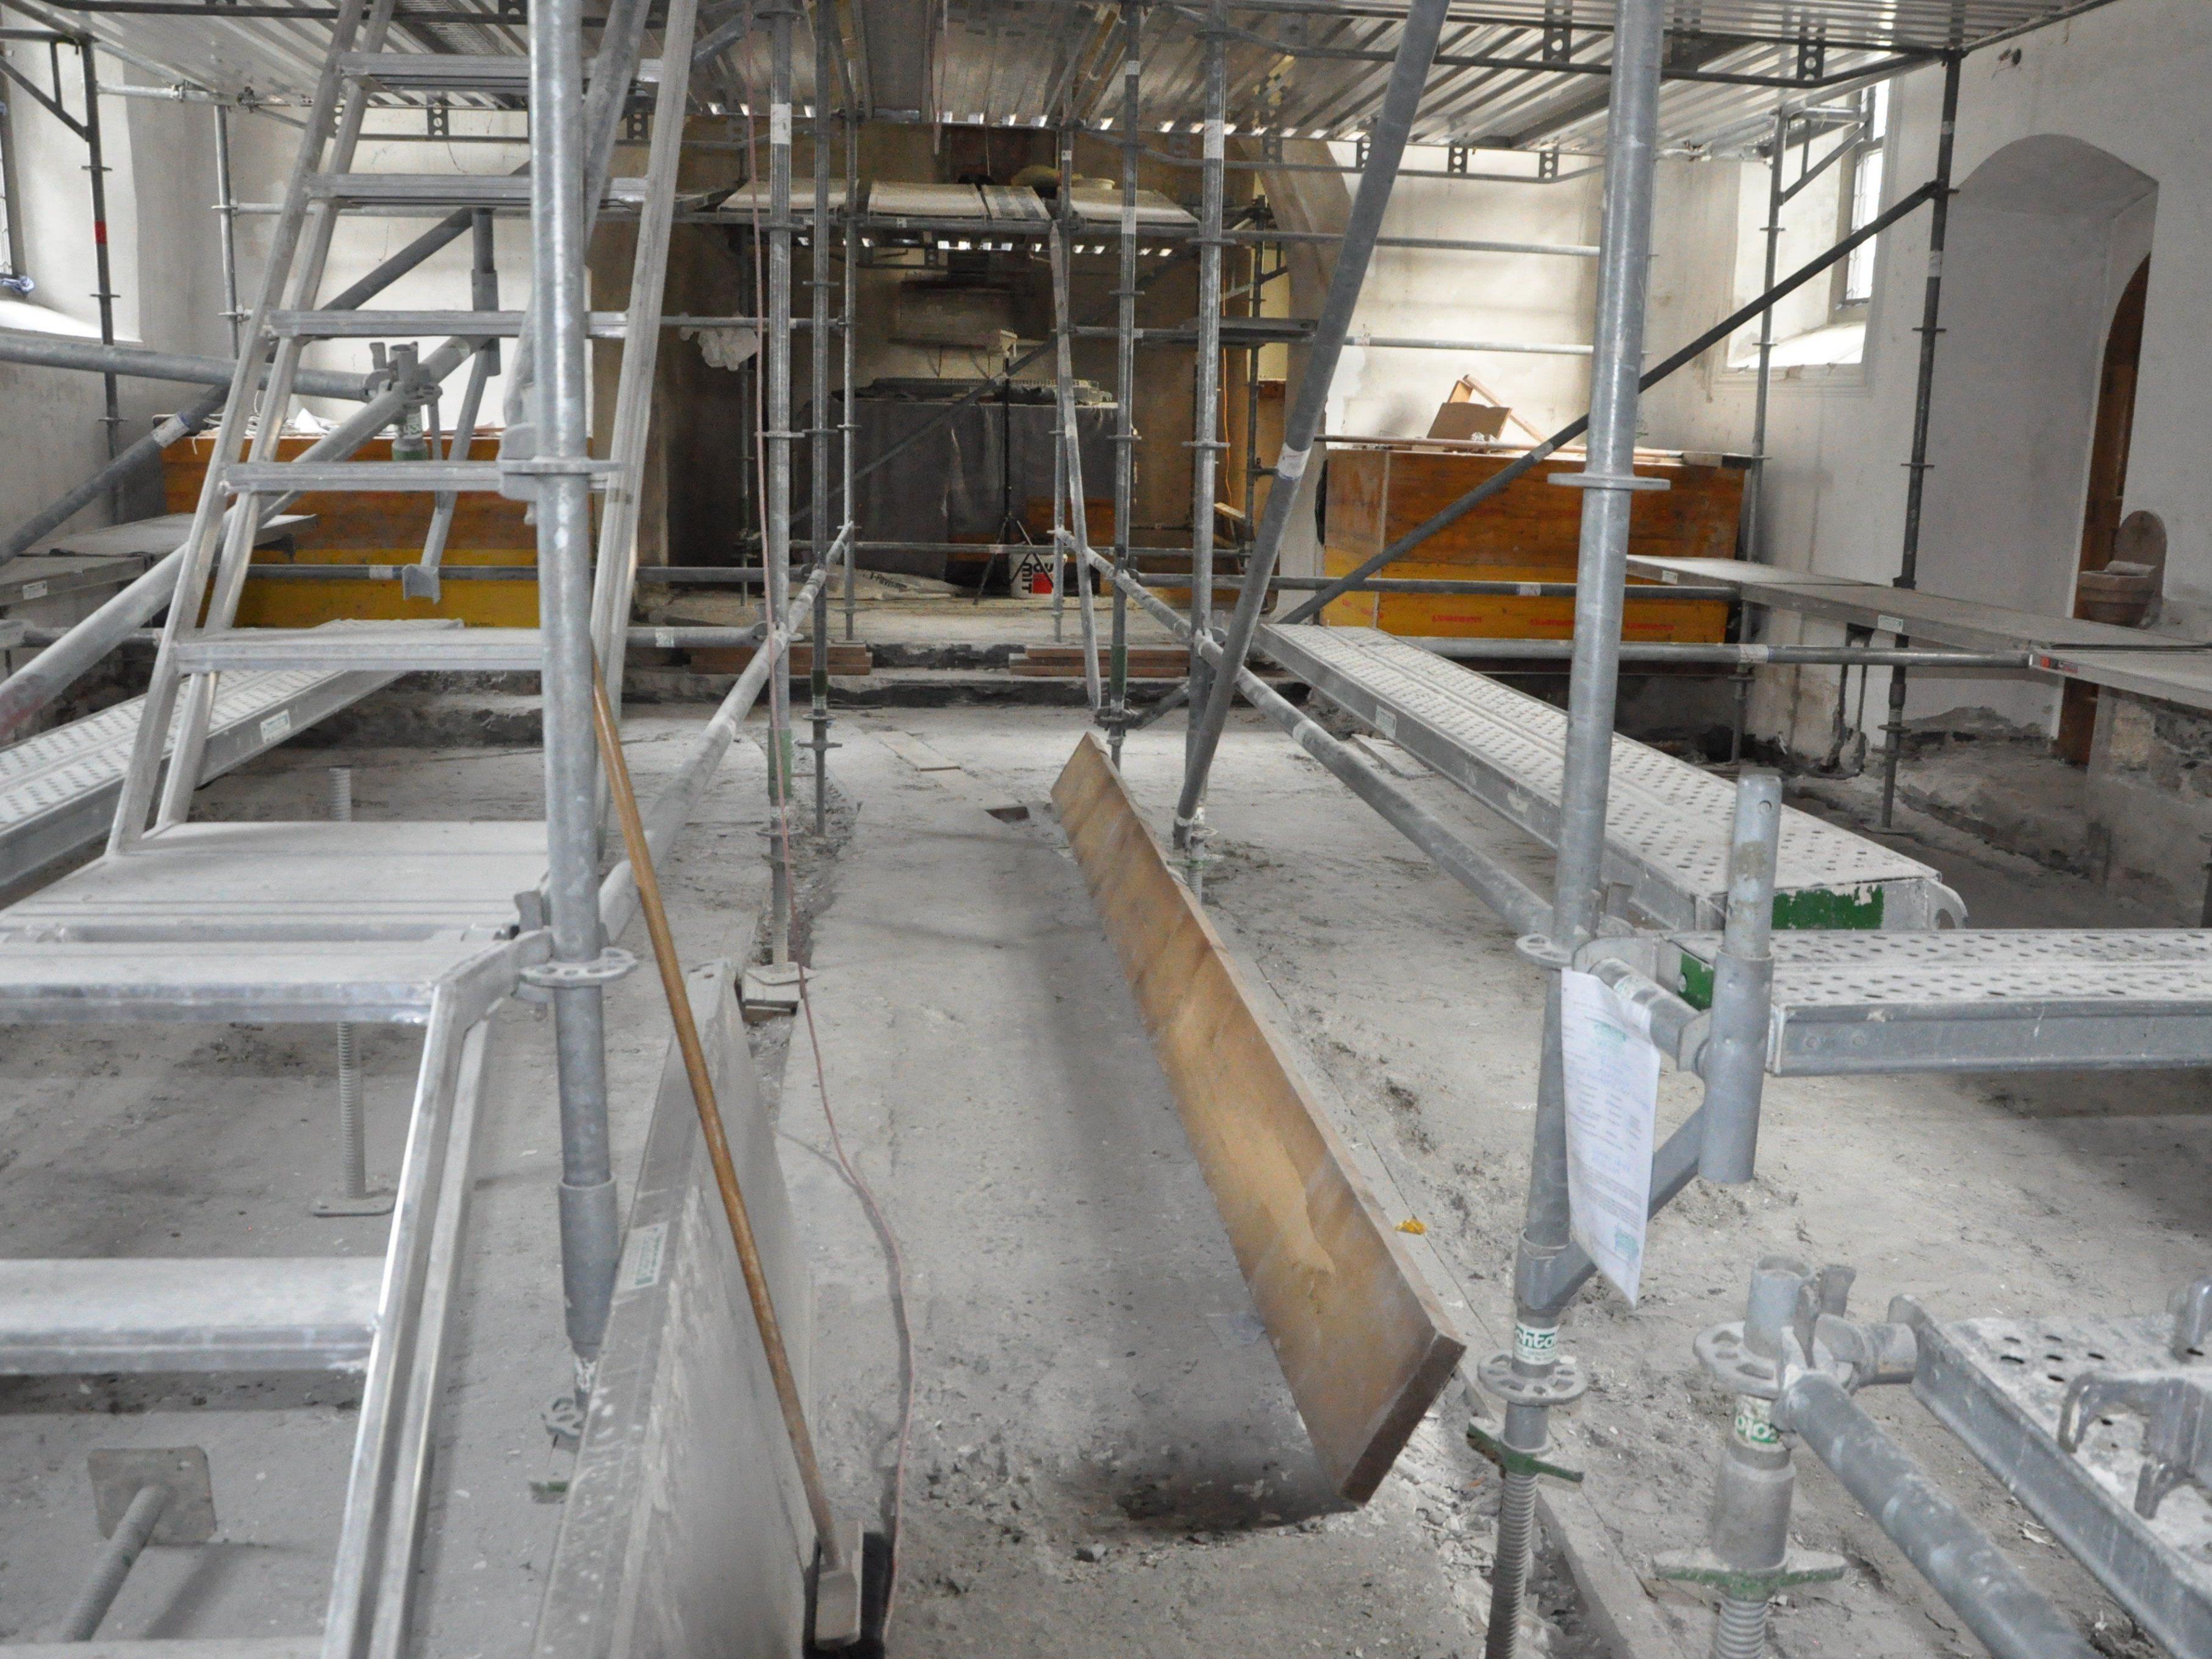 Archiologische Grabungen in der Rankweiler St. Peter Kirche